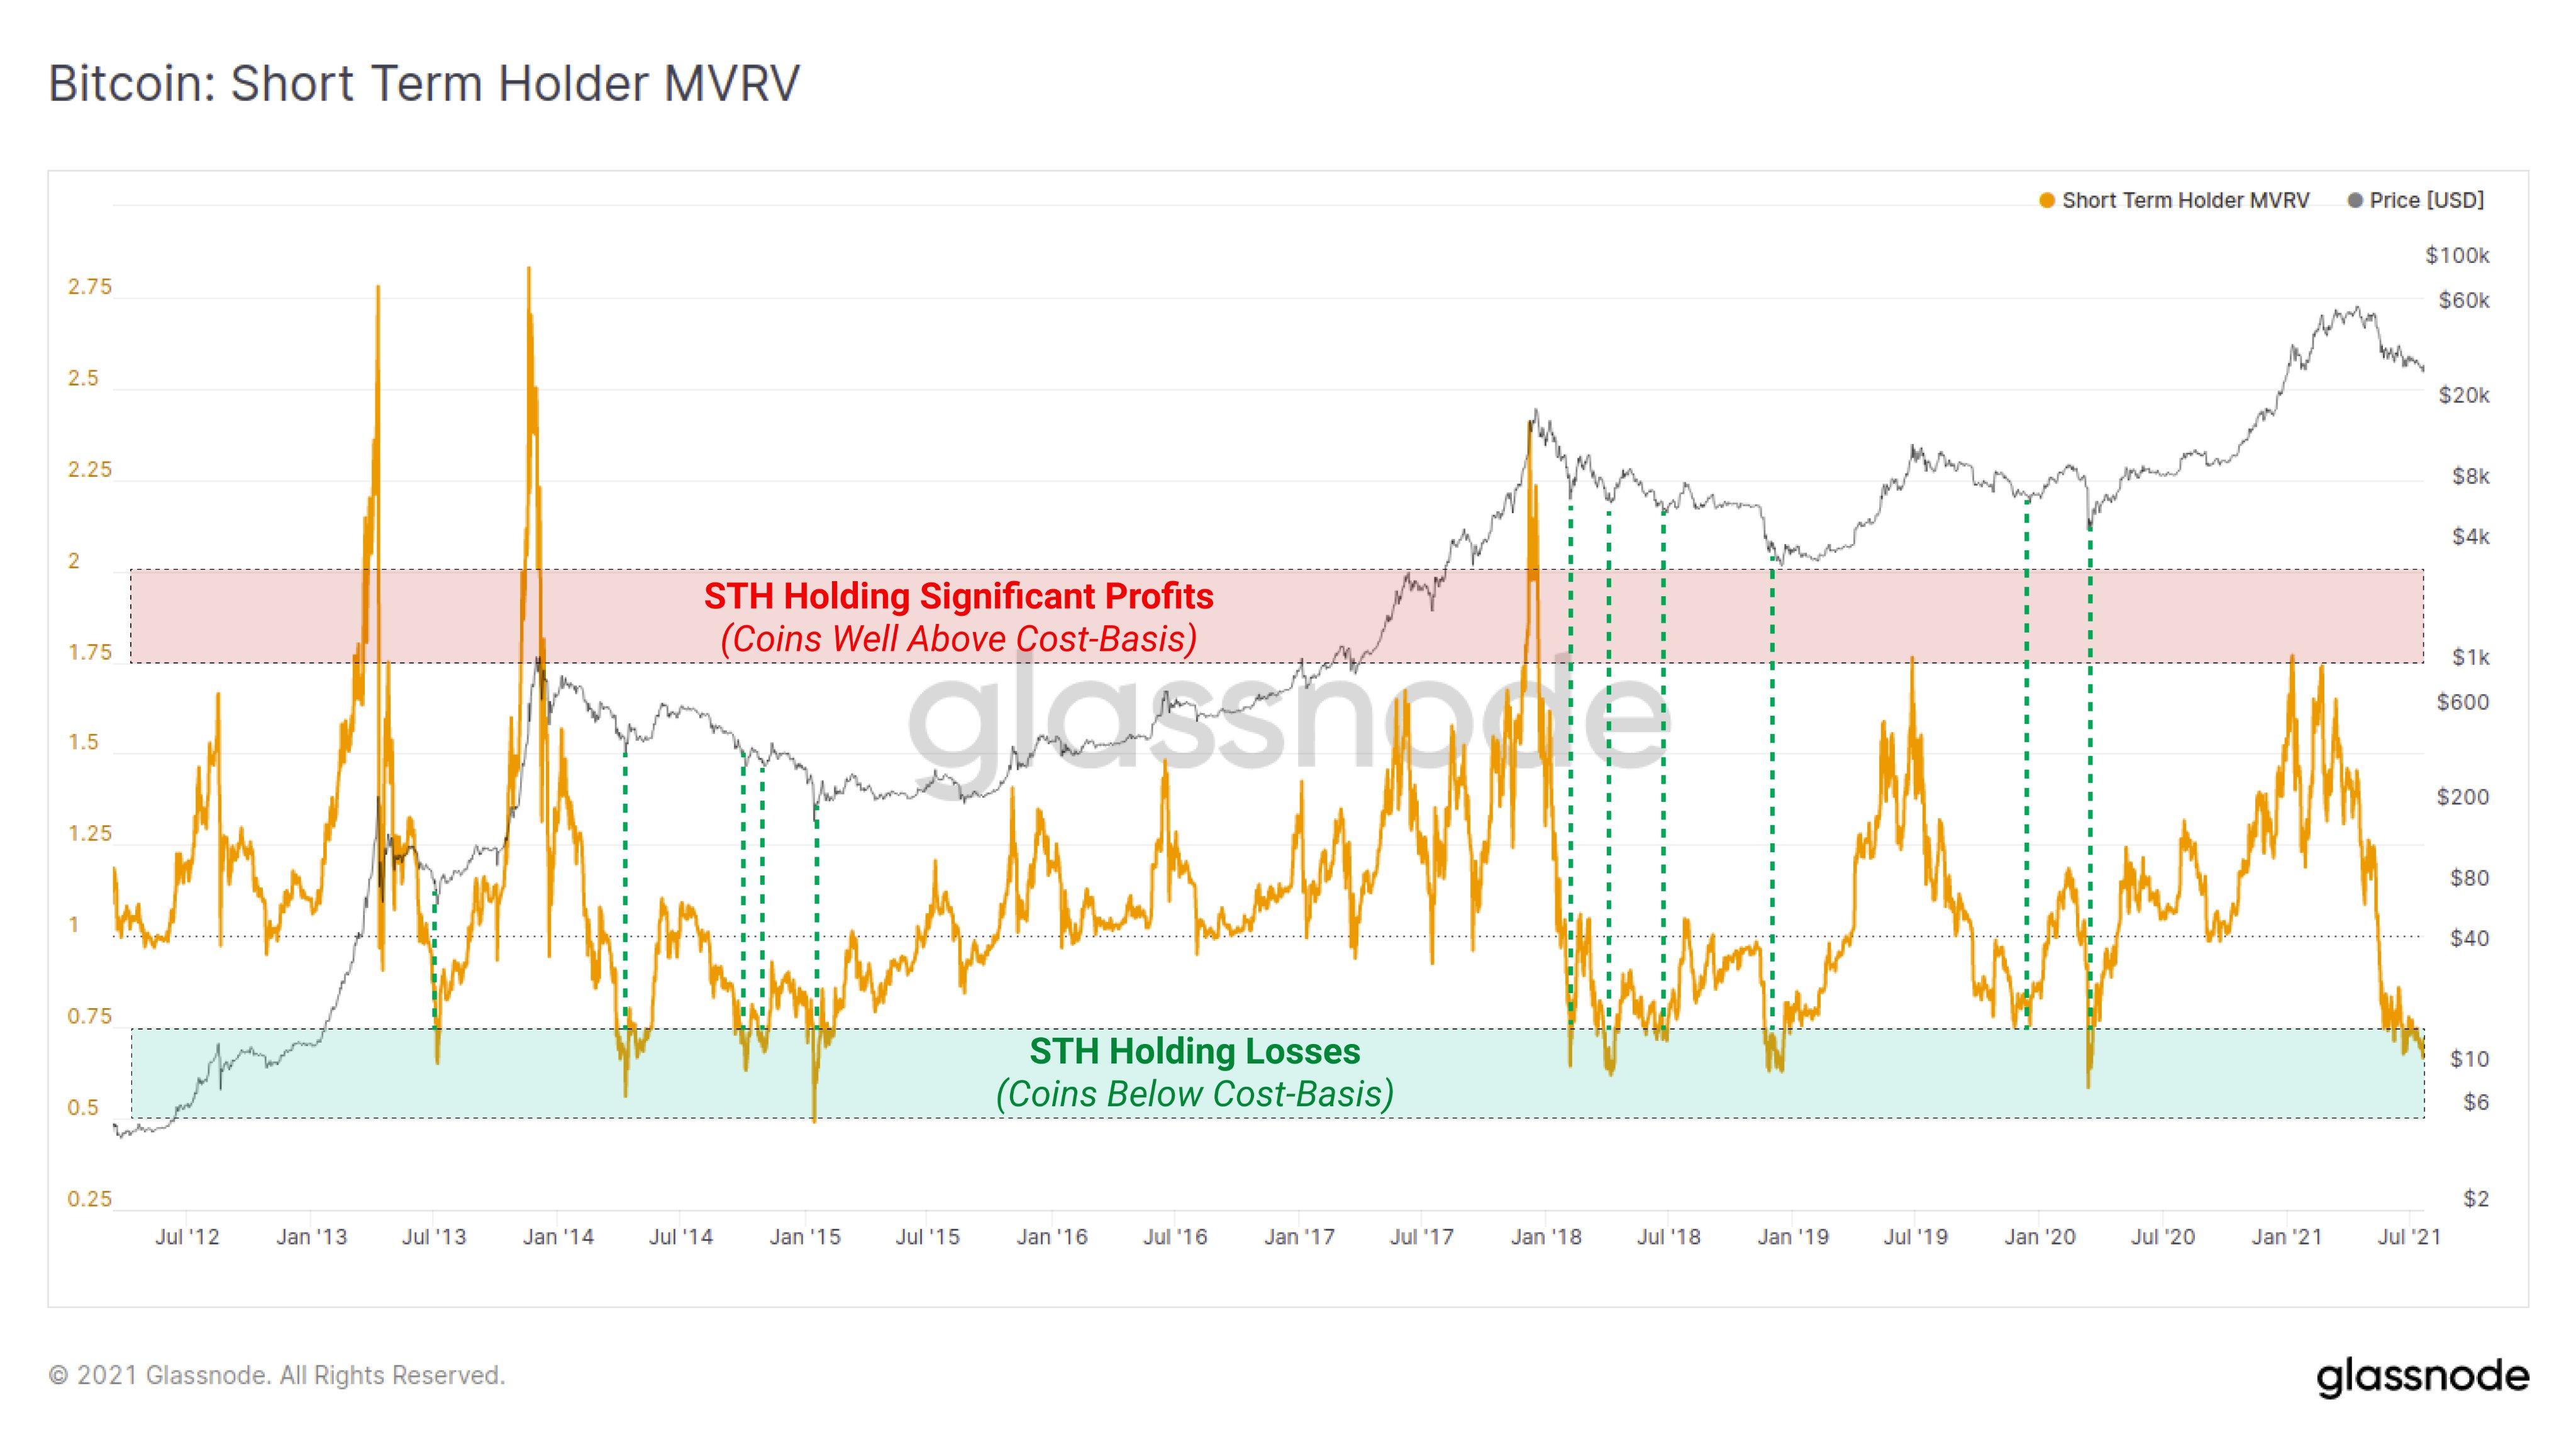 Bitcoin Short Term Holder MVRV